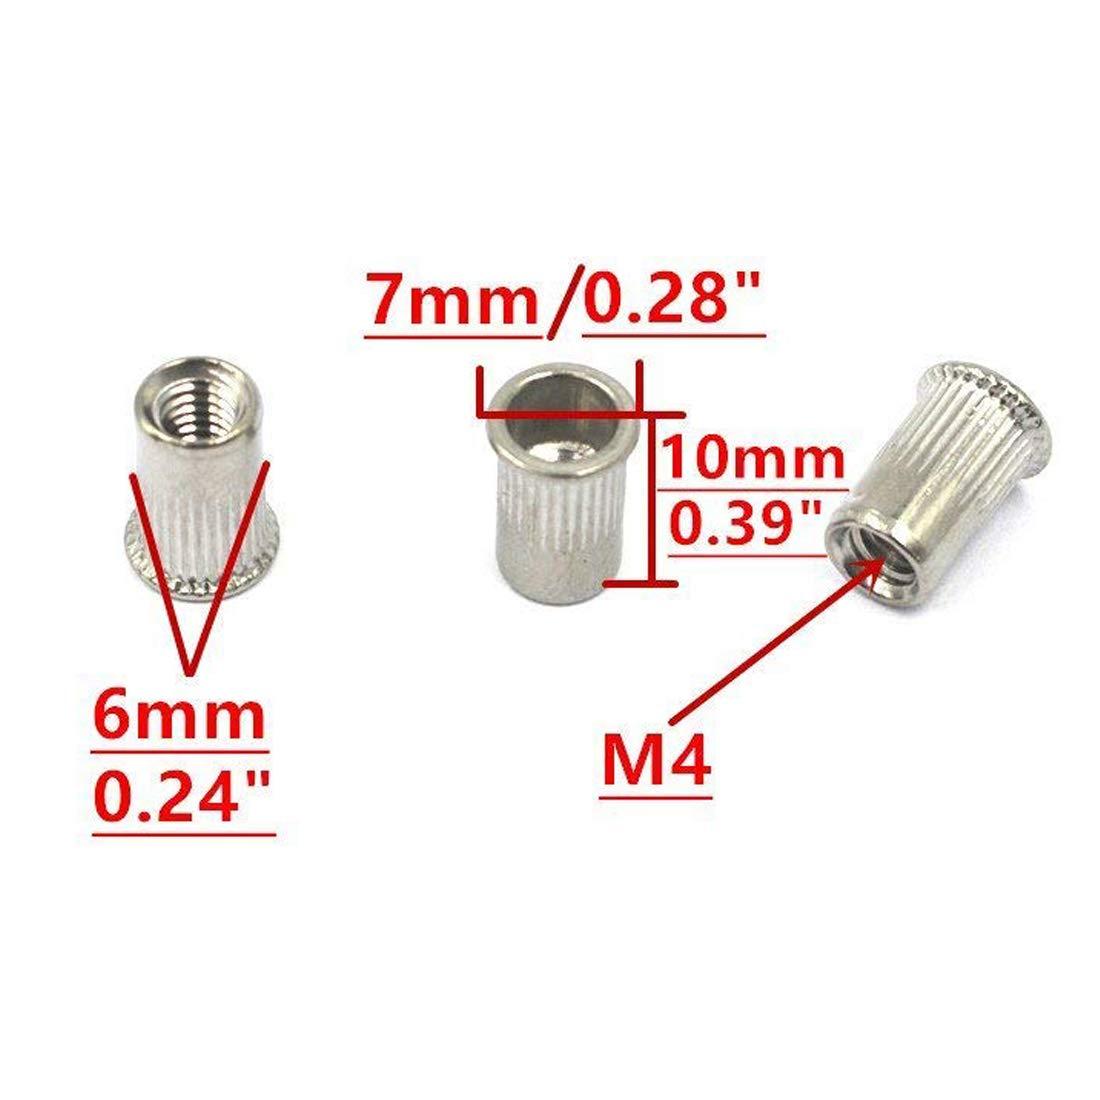 M8 Sydien M8 x 17mm Knurled Countersunk Head Blind Rivet Nut Insert Nutsert 20PCS